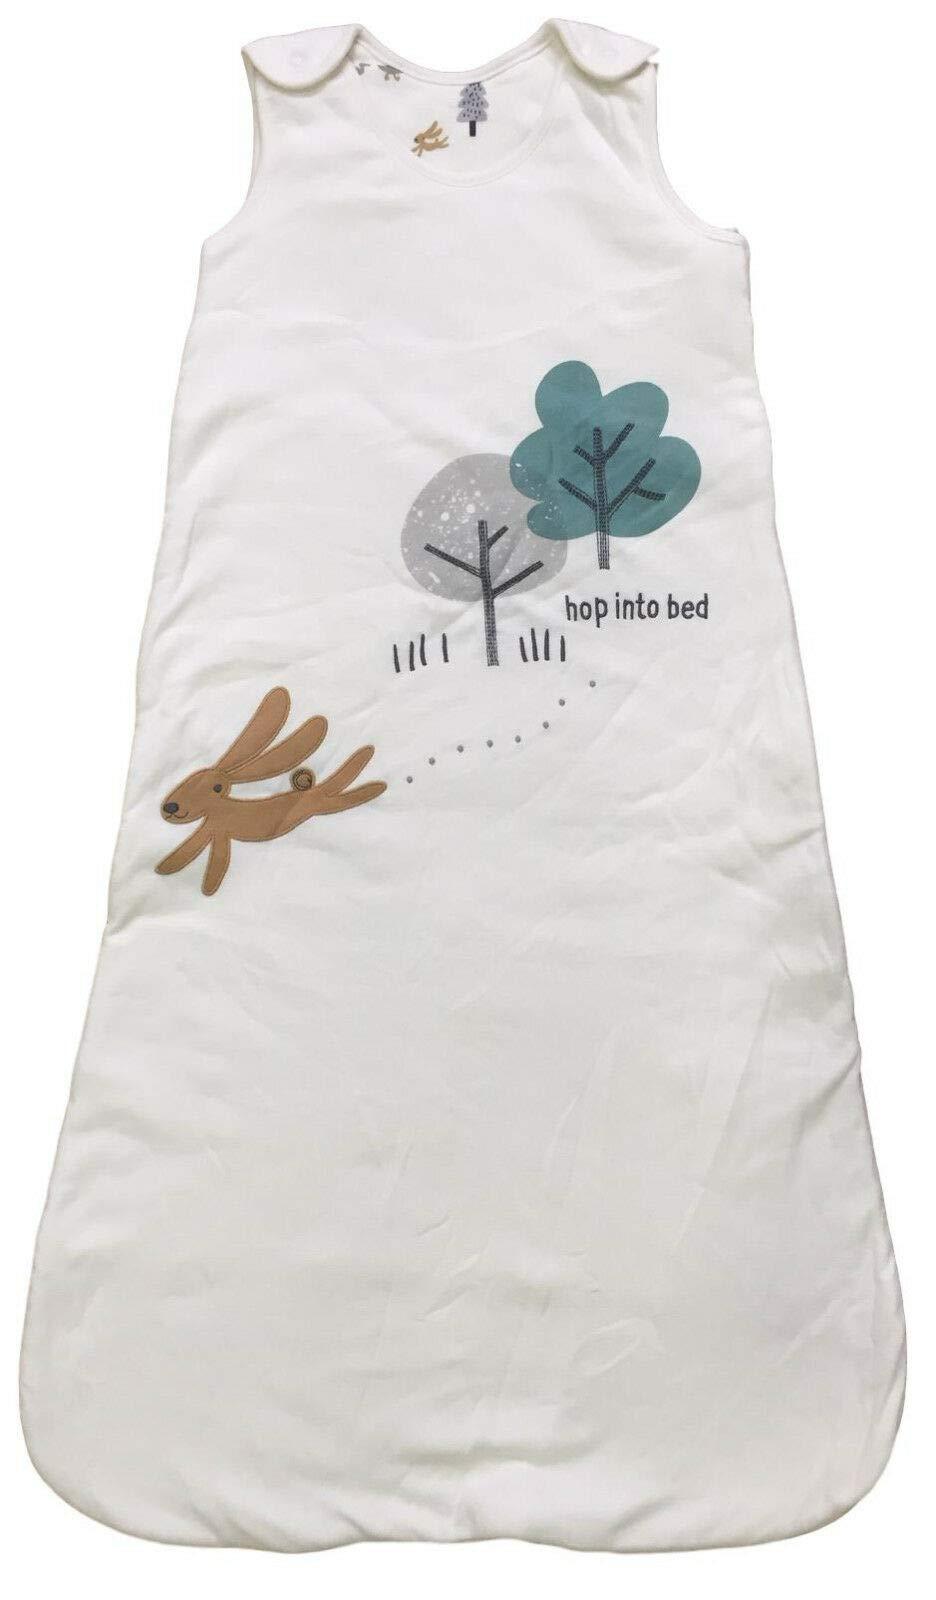 Paradise Baby Sleeping Bag EX Marks /& Spencer Boys Girls 0-36M TOG 1.2-2.4 New